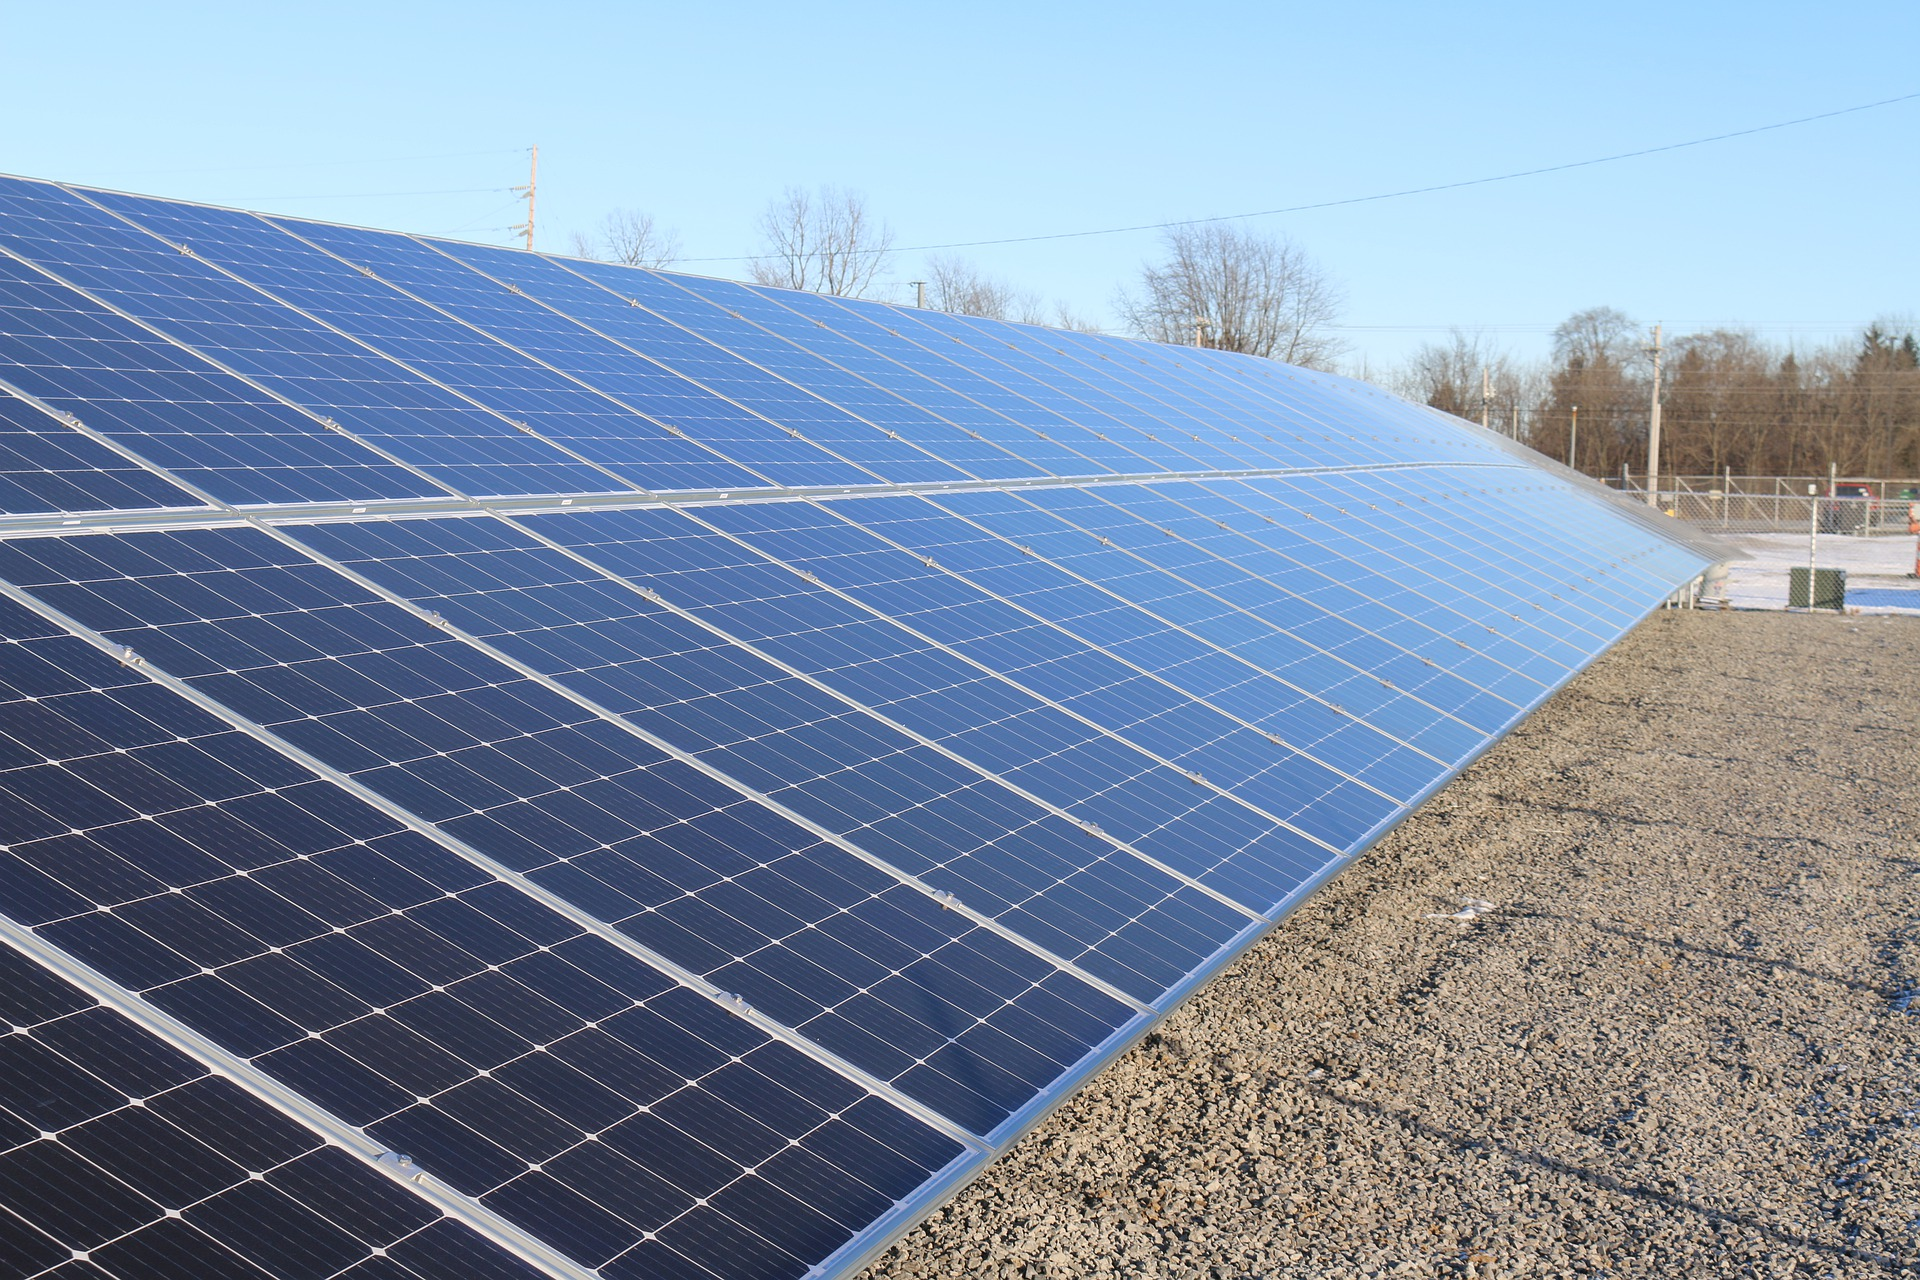 Elektrownia słoneczna (fot. mat. pras. Enea)